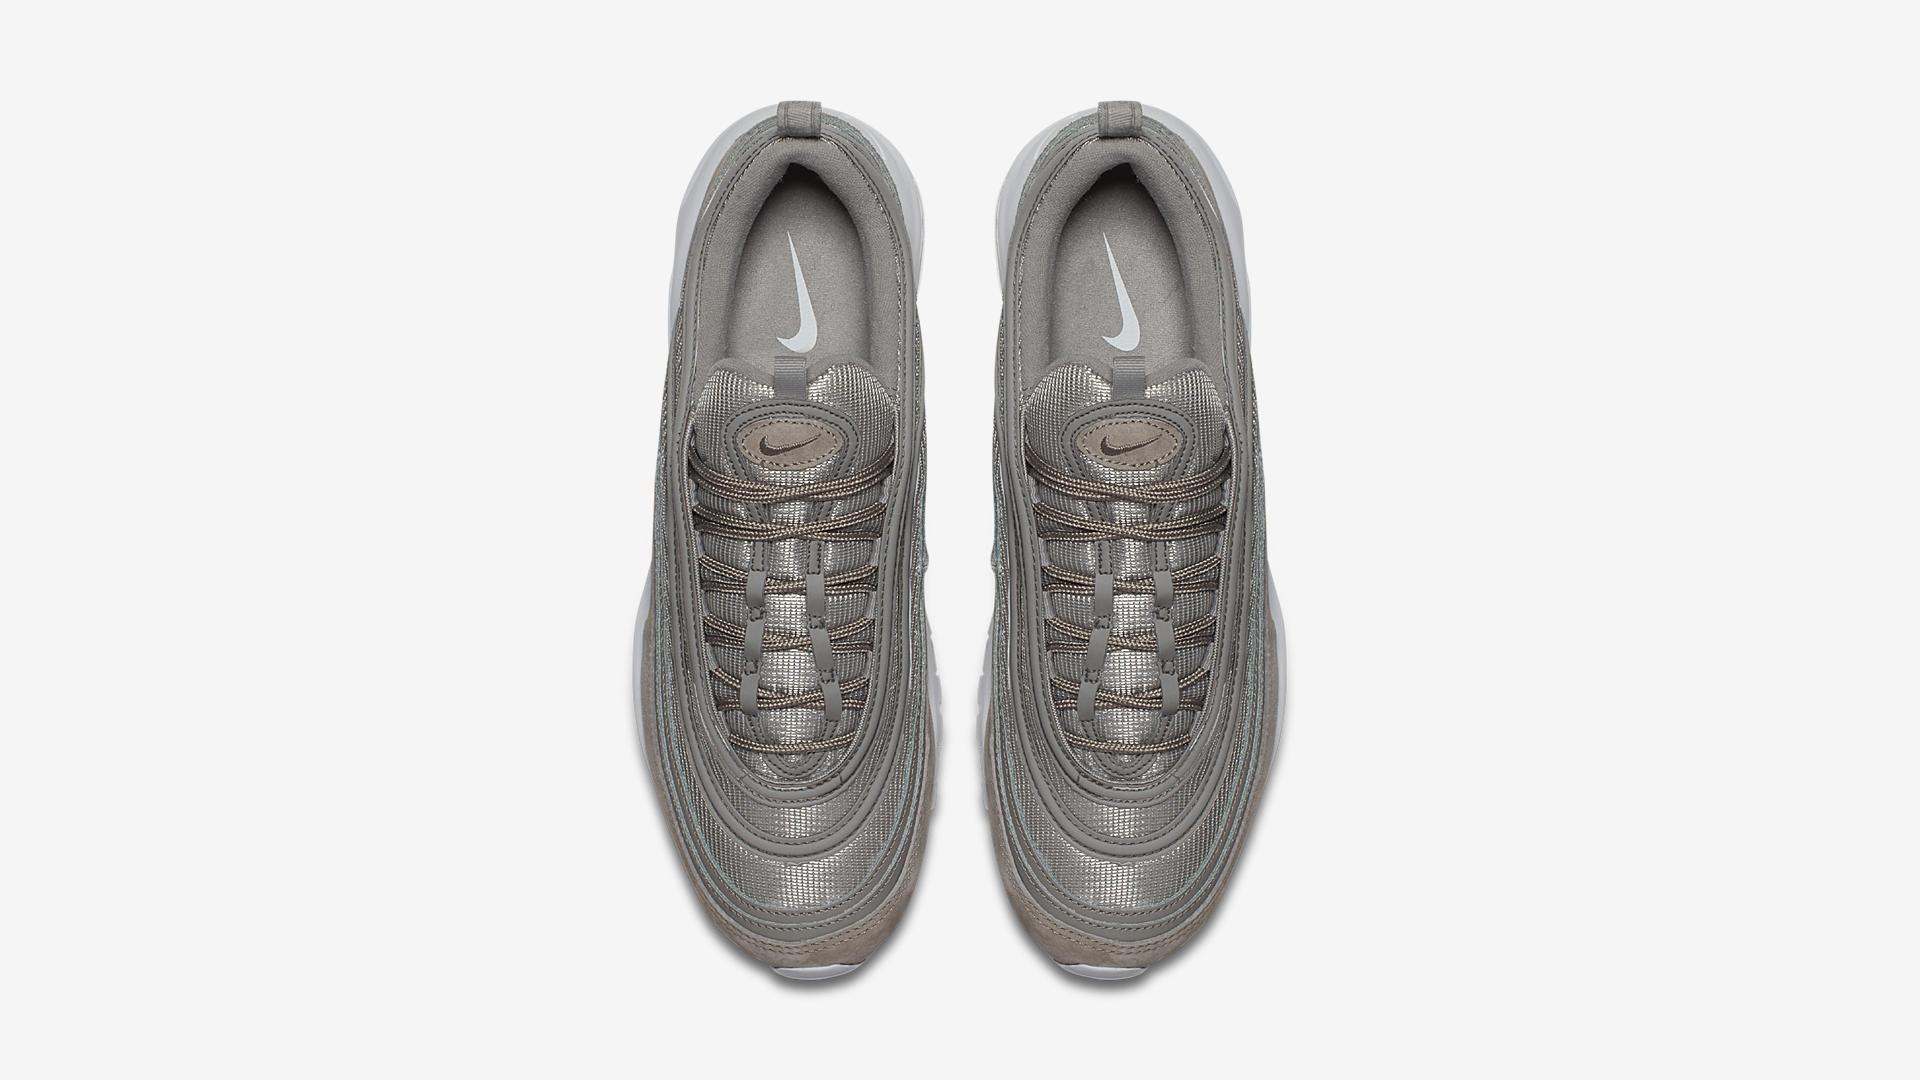 921826 002 Nike Air Max 97 Premium Cobblestone 3